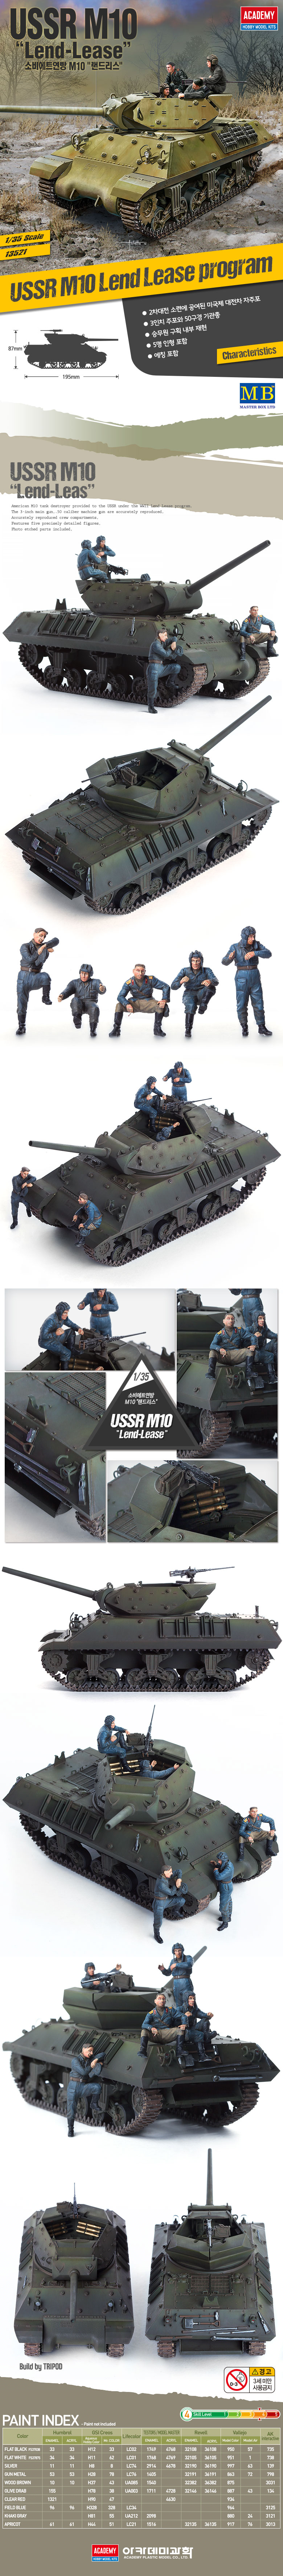 13521_ussr_m10_lend-lease_kor.jpg